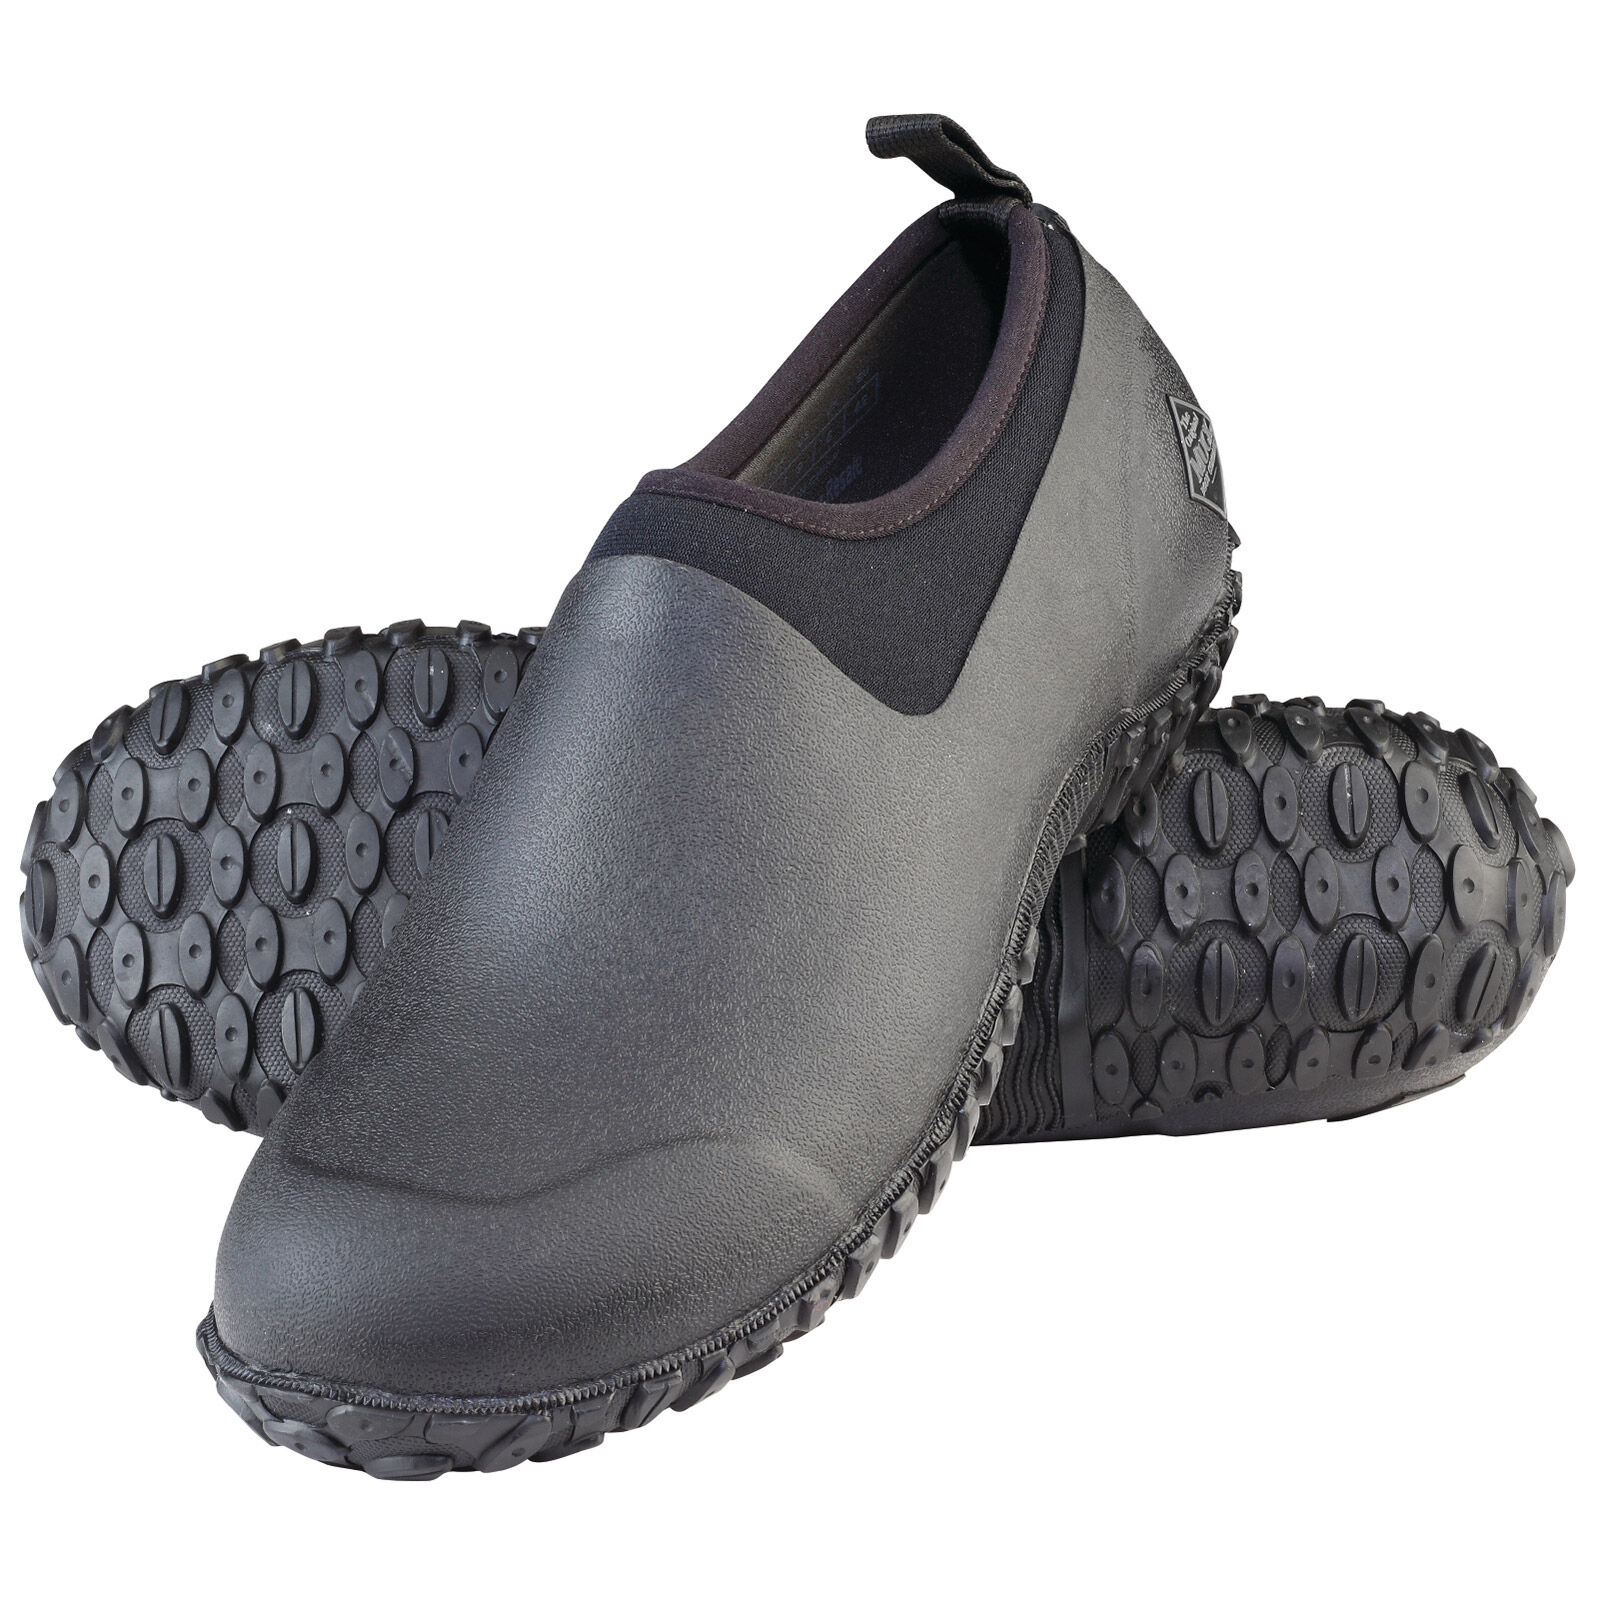 Muck Boots Muckster Ll Low Rubber Kids Shoes